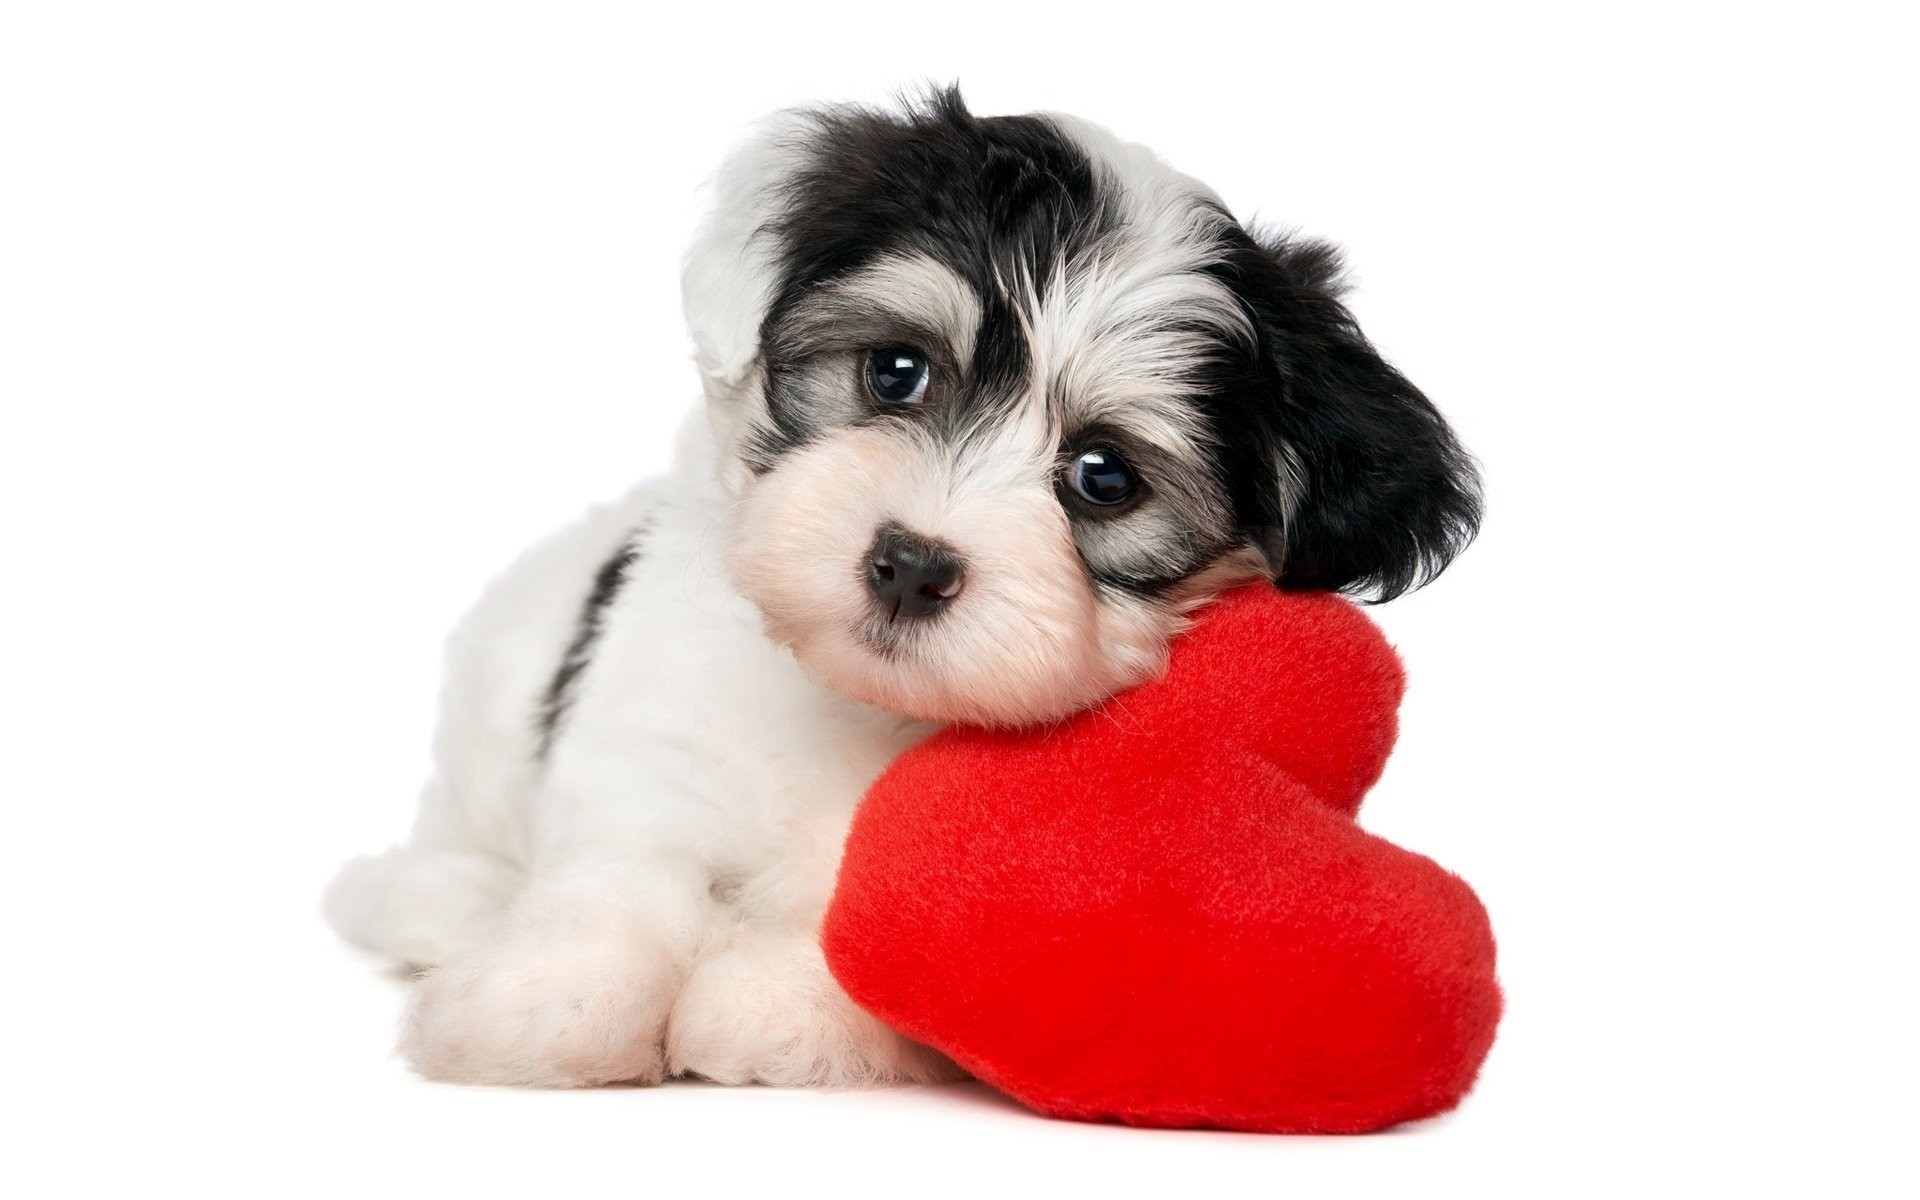 Animal – Puppy Animal Dog Heart Cute Wallpaper